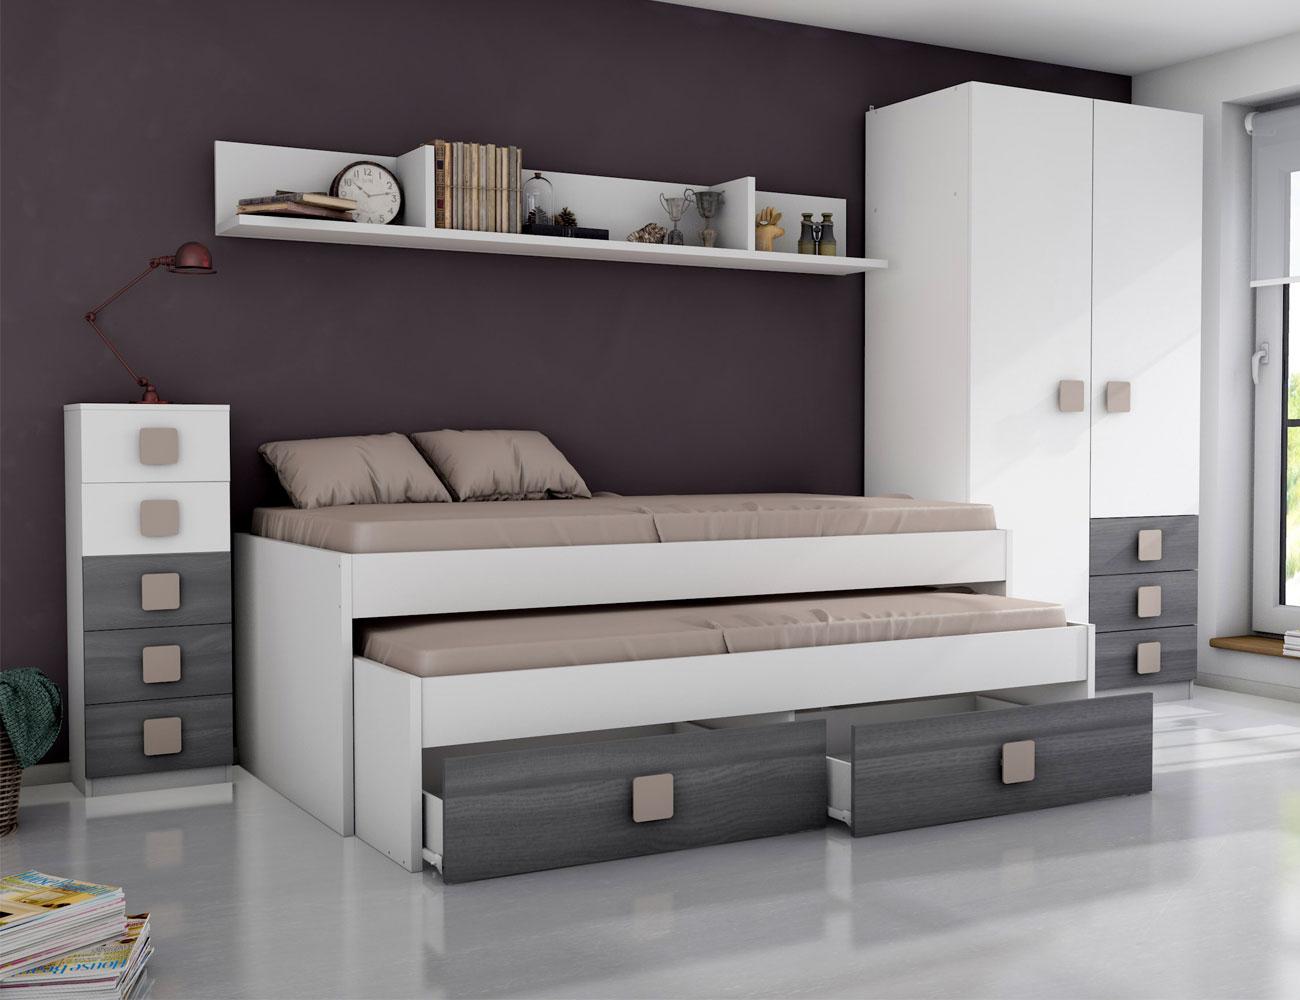 Dormitorio juvenil ceniza moka4